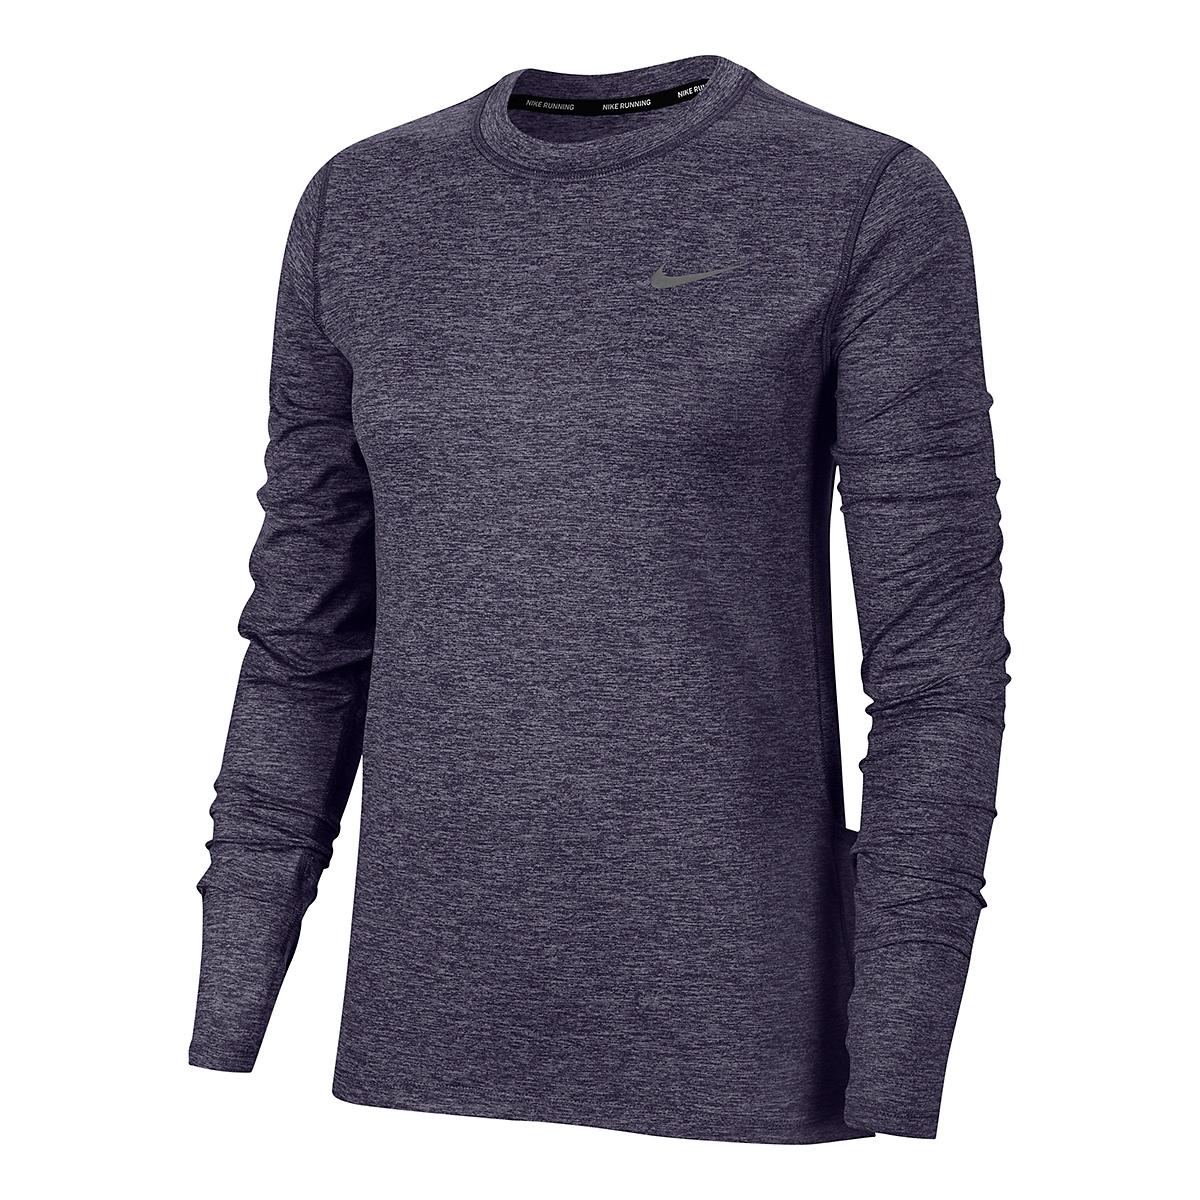 Women's Nike Element Crew Long Sleeve - Color: Dark Raisin/Light Violet/Reflective Silver - Size: XS, Dark Raisin/Light Violet/Reflective Silver, large, image 2